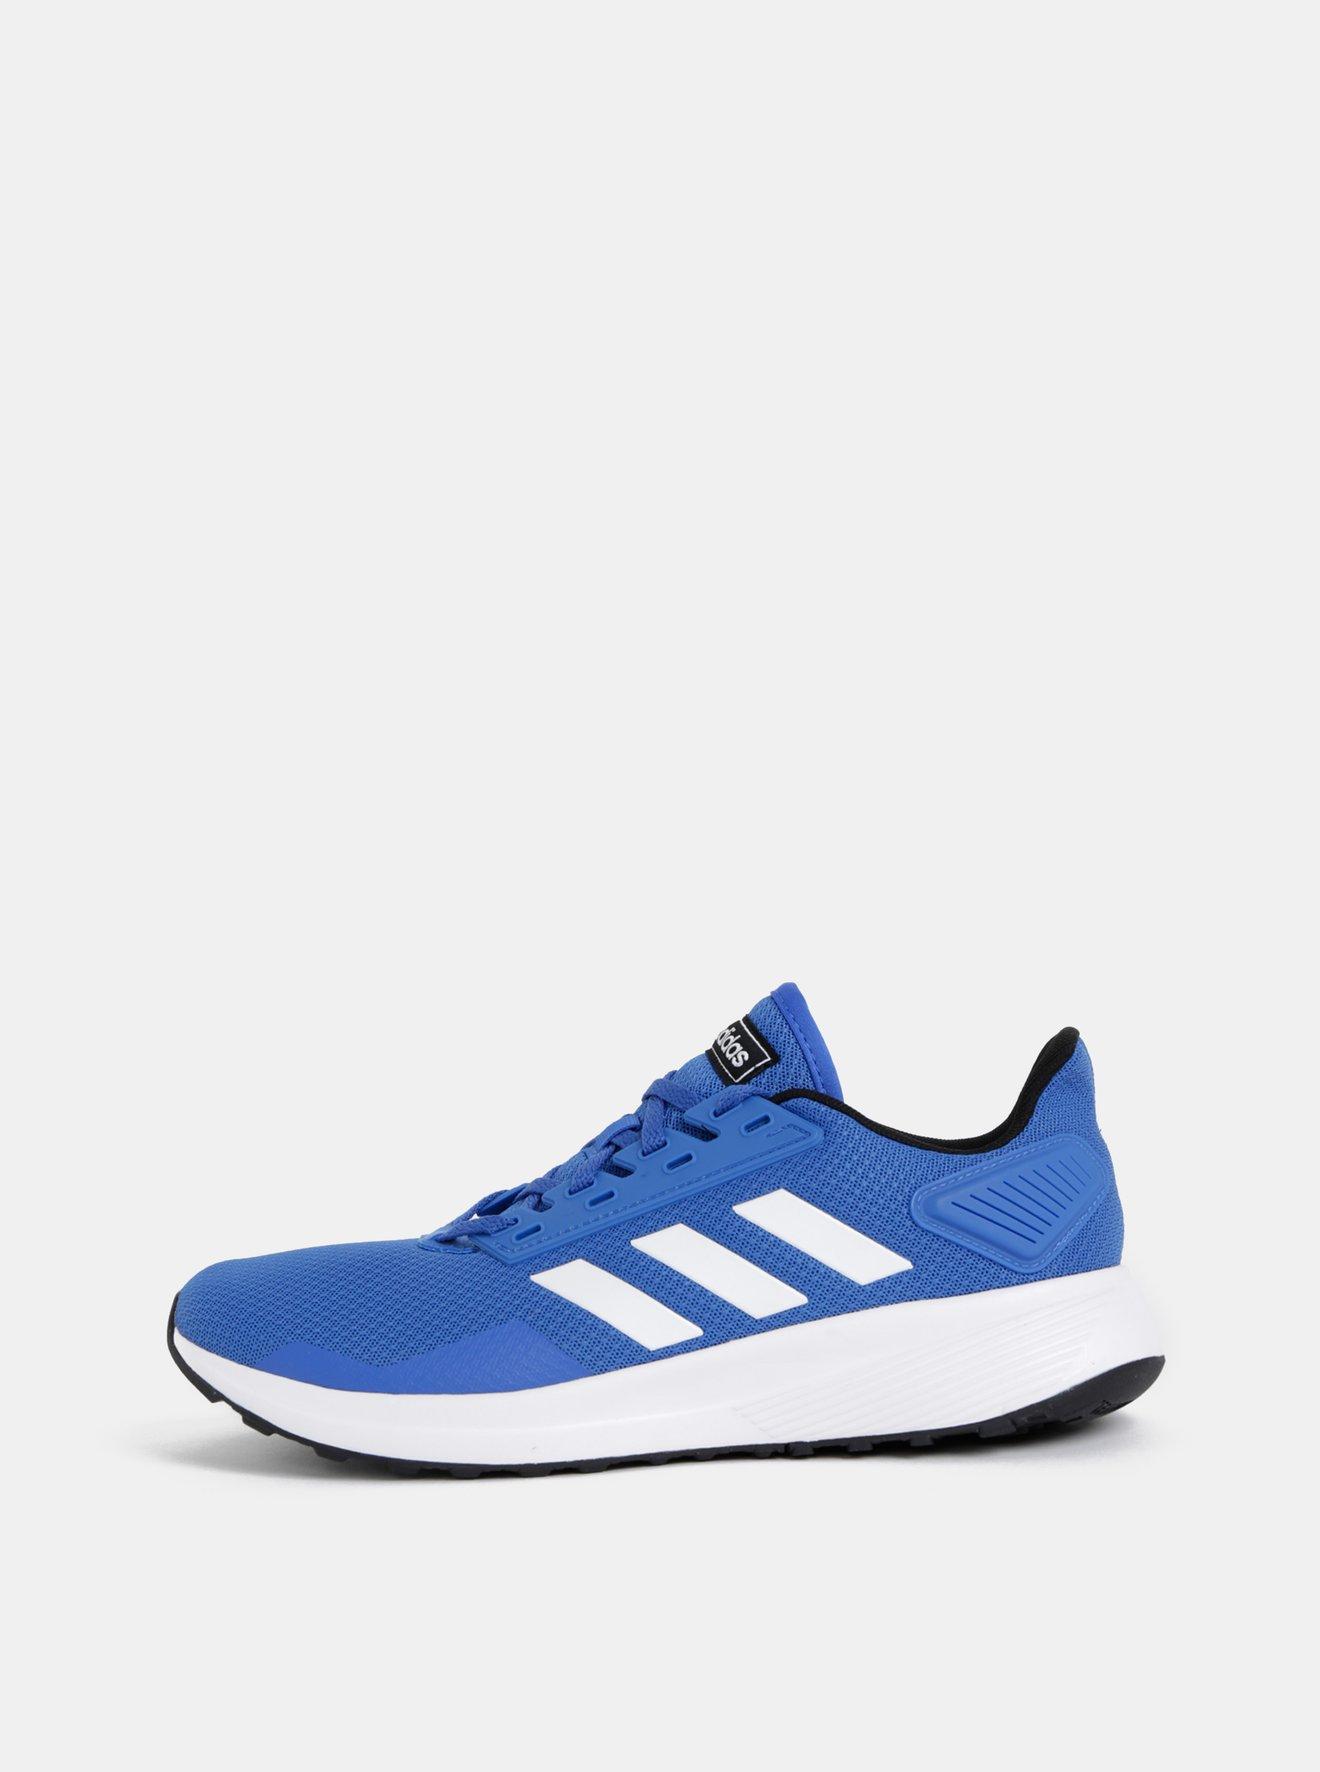 Modré pánské tenisky adidas CORE Duramo 9